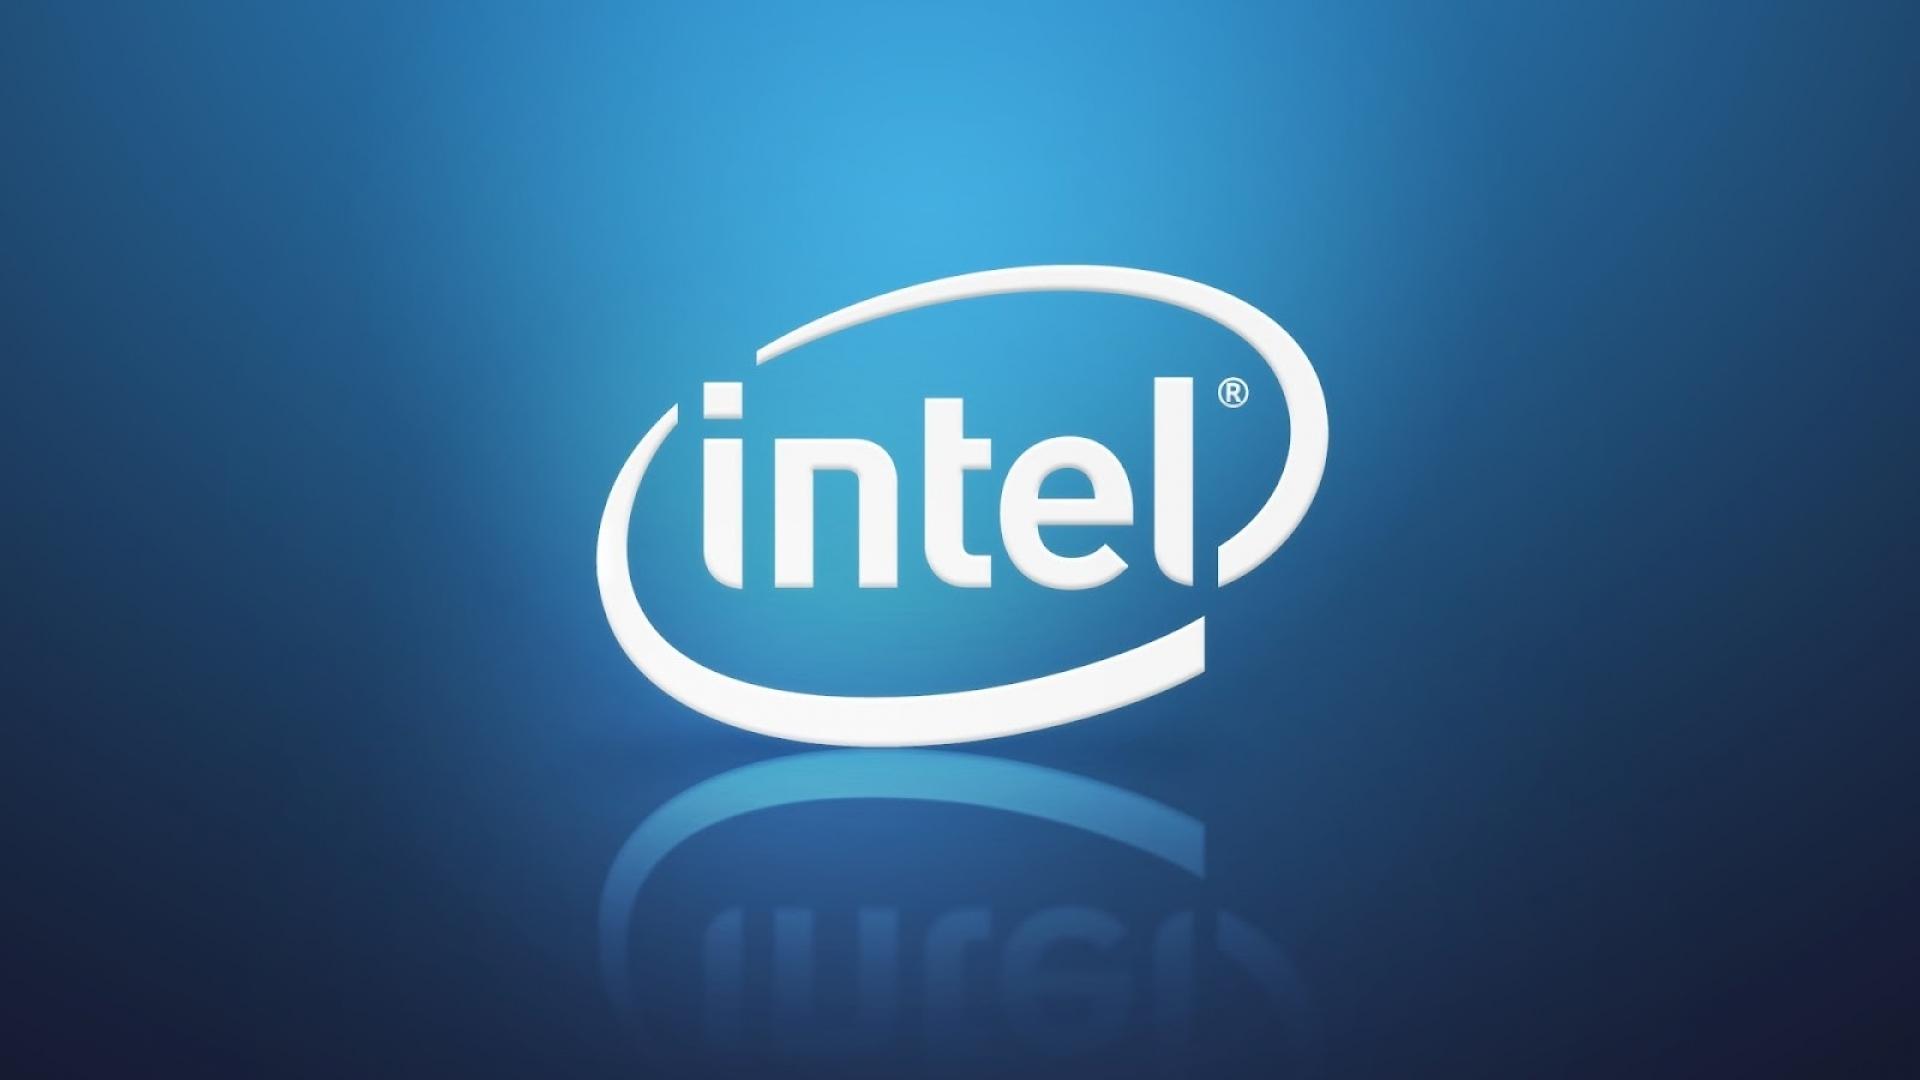 Intel brand wallpapers HD